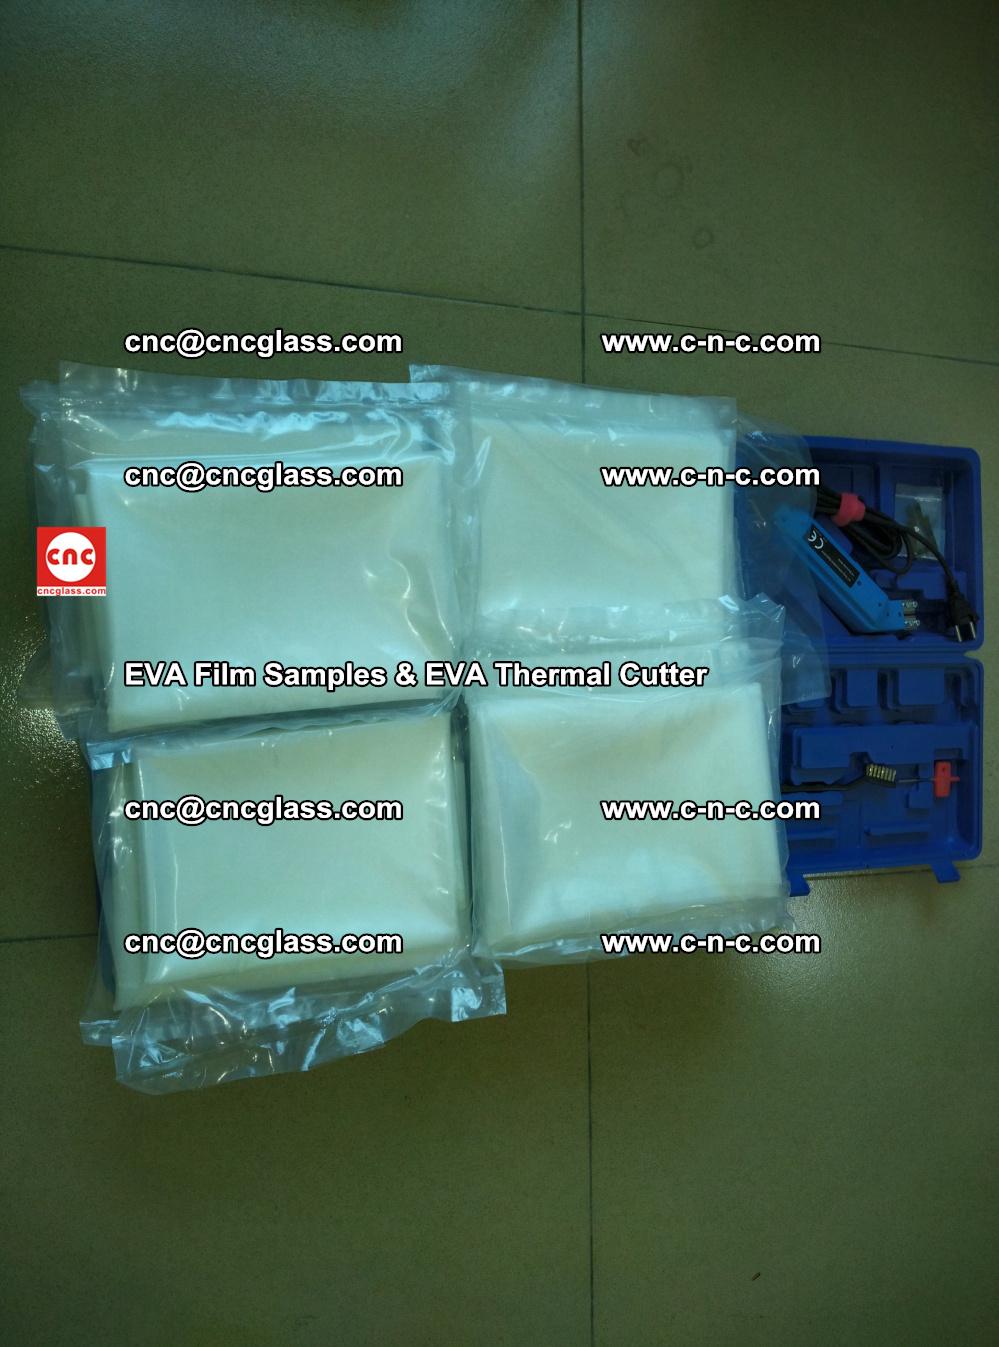 EVAFORCE SUPER CLEAR EVA Film Samples and EVA Thermal Cutter (42)